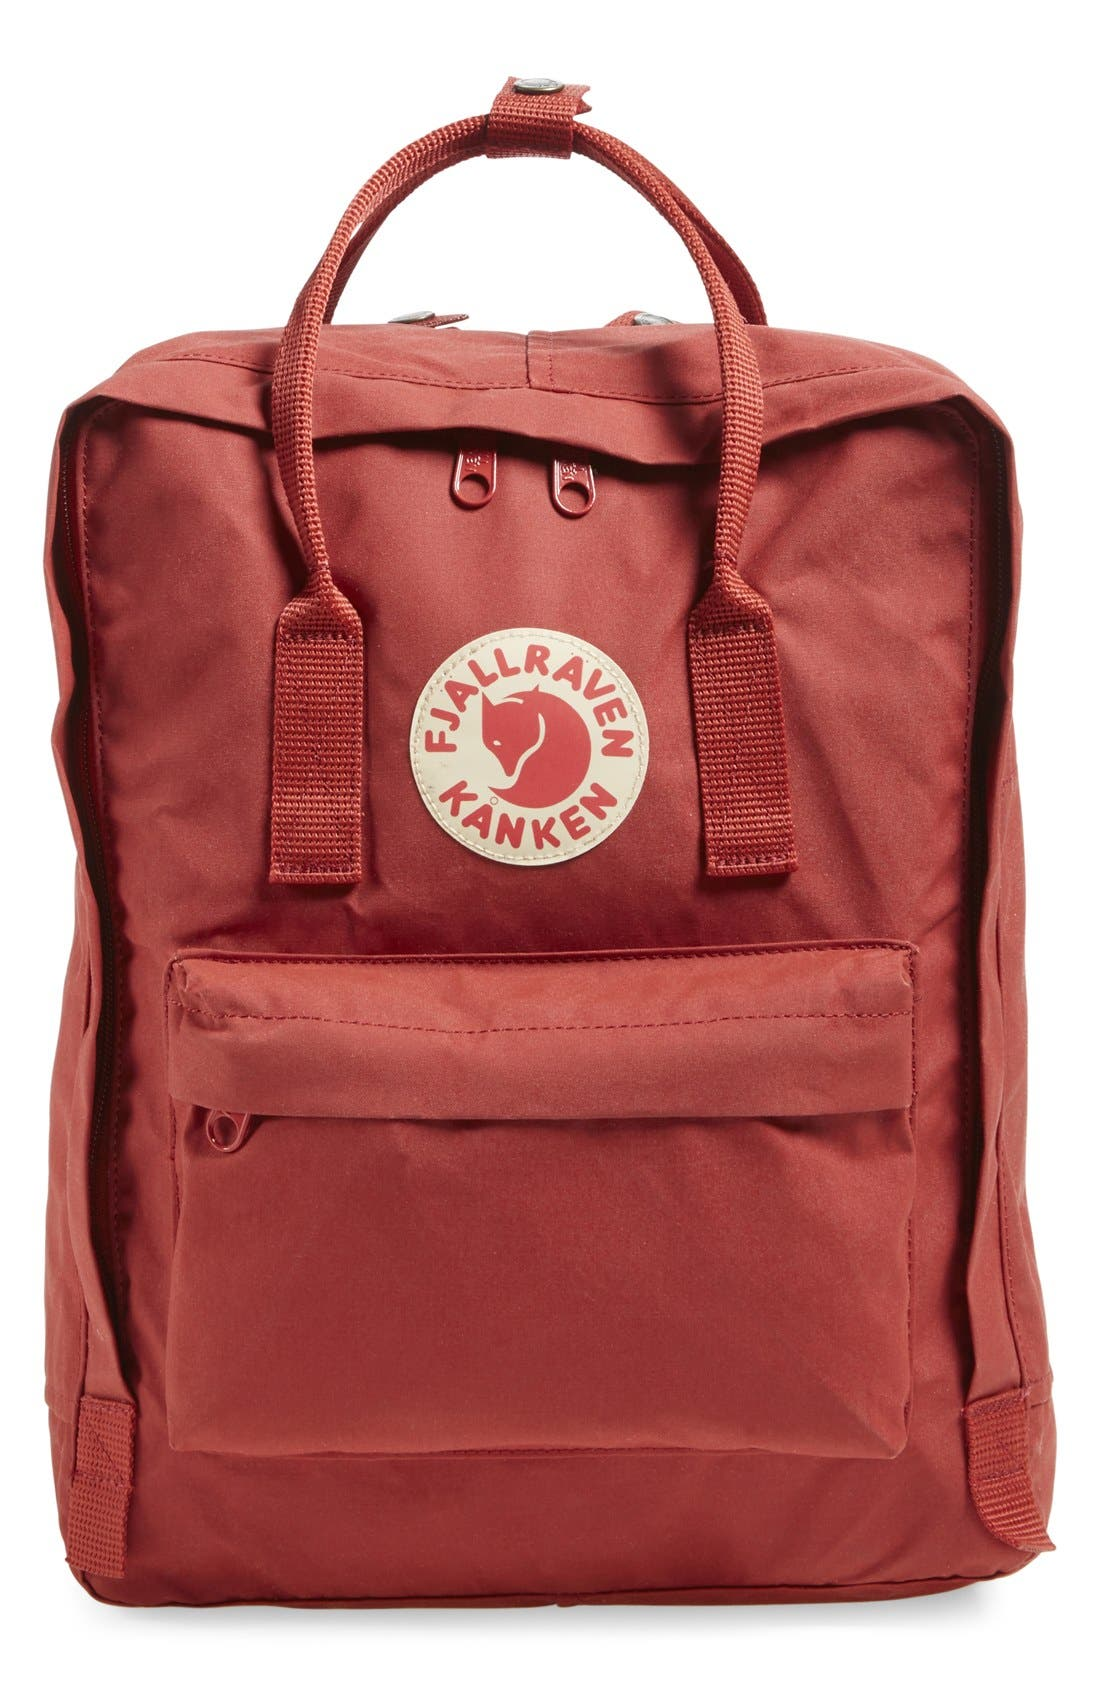 Main Image - Fjällräven 'Kånken' Water Resistant Backpack